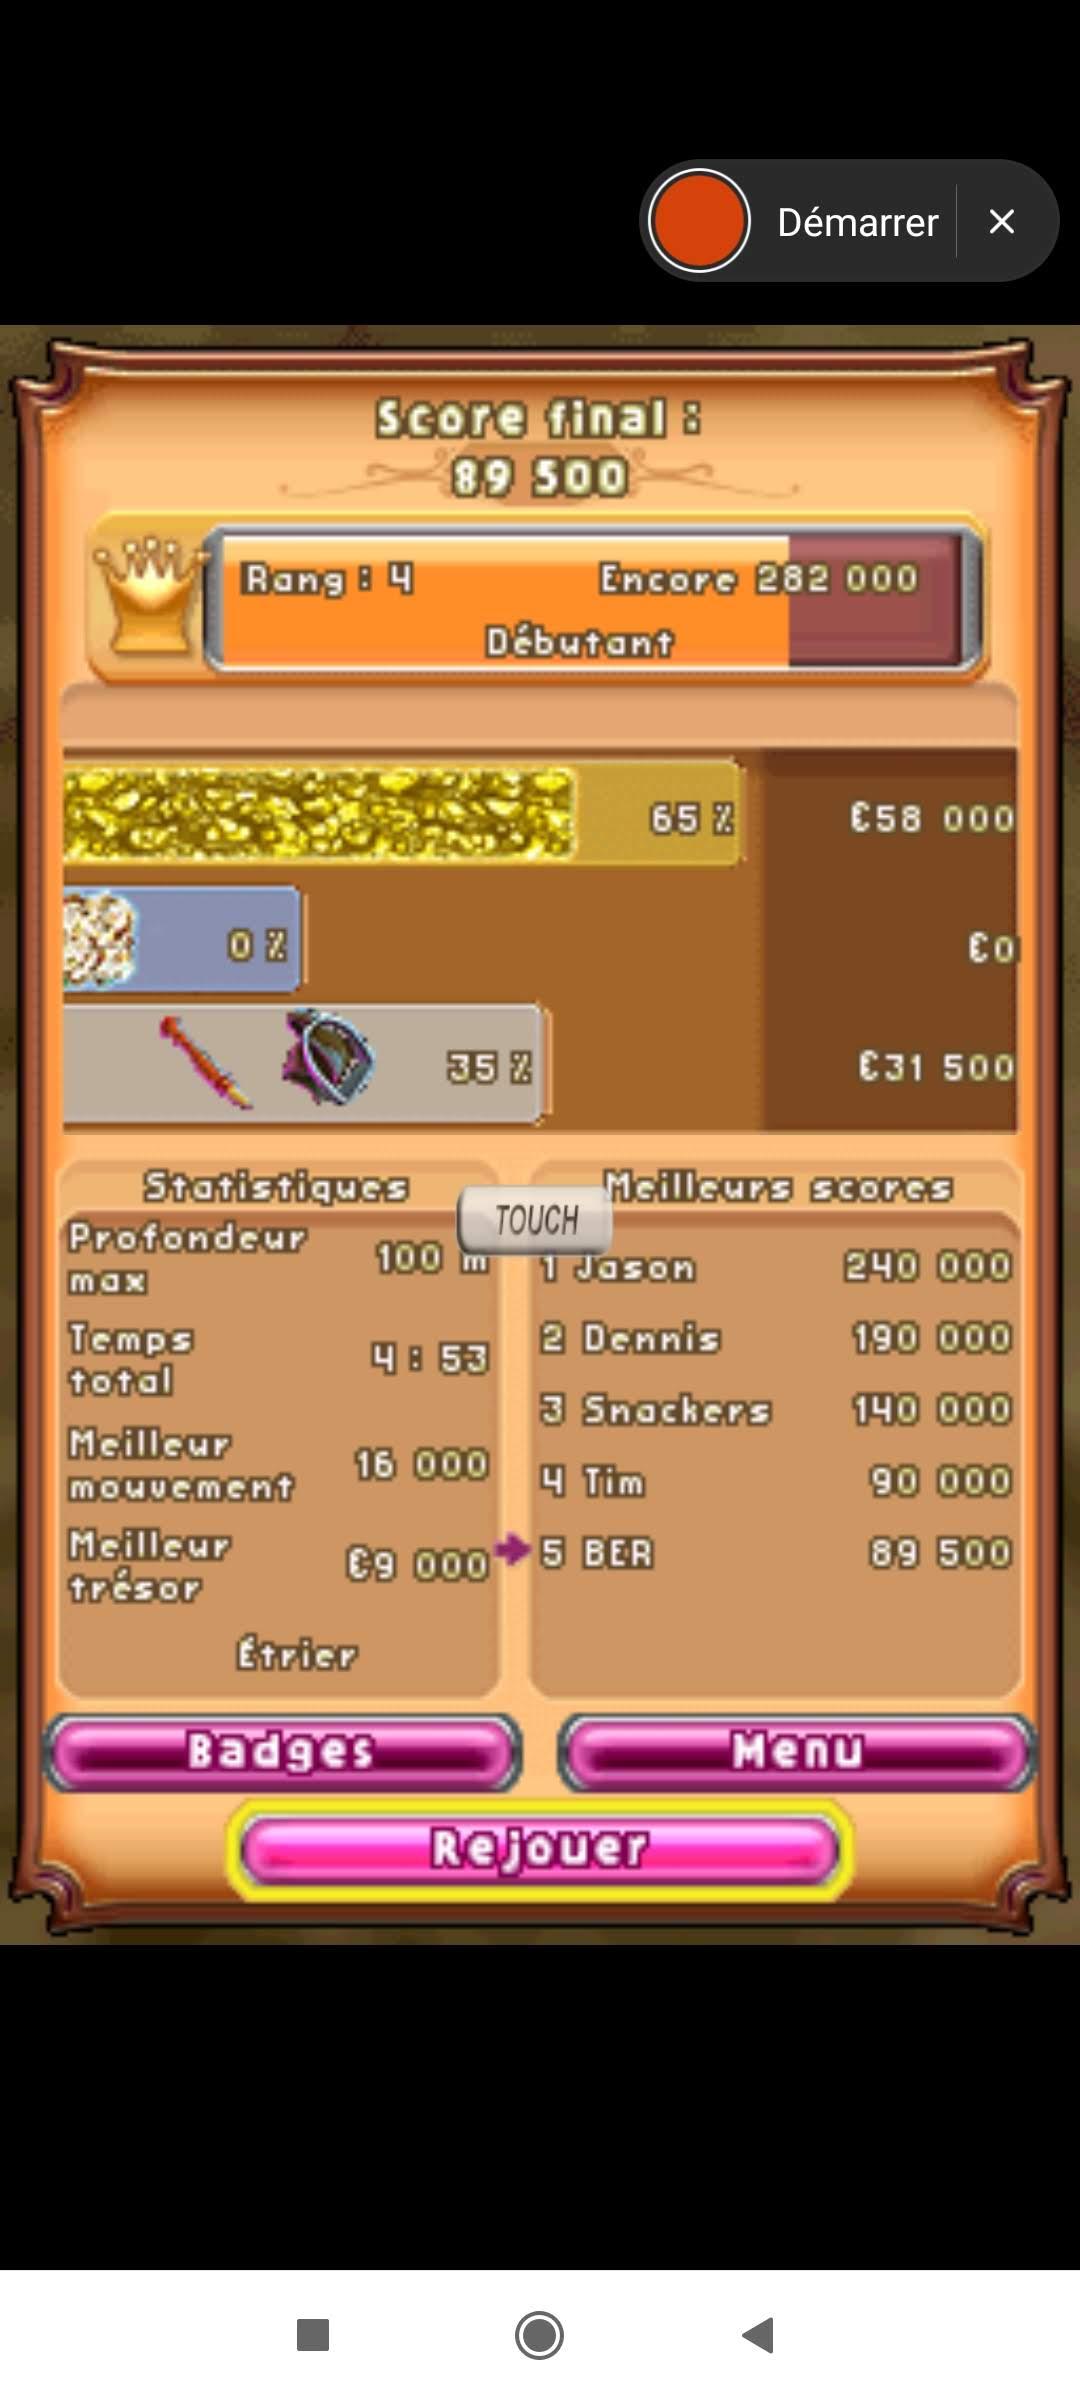 Larquey: Bejeweled 3: Diamond Mine [Best Move] (Nintendo DS Emulated) 16,000 points on 2020-09-27 12:28:33